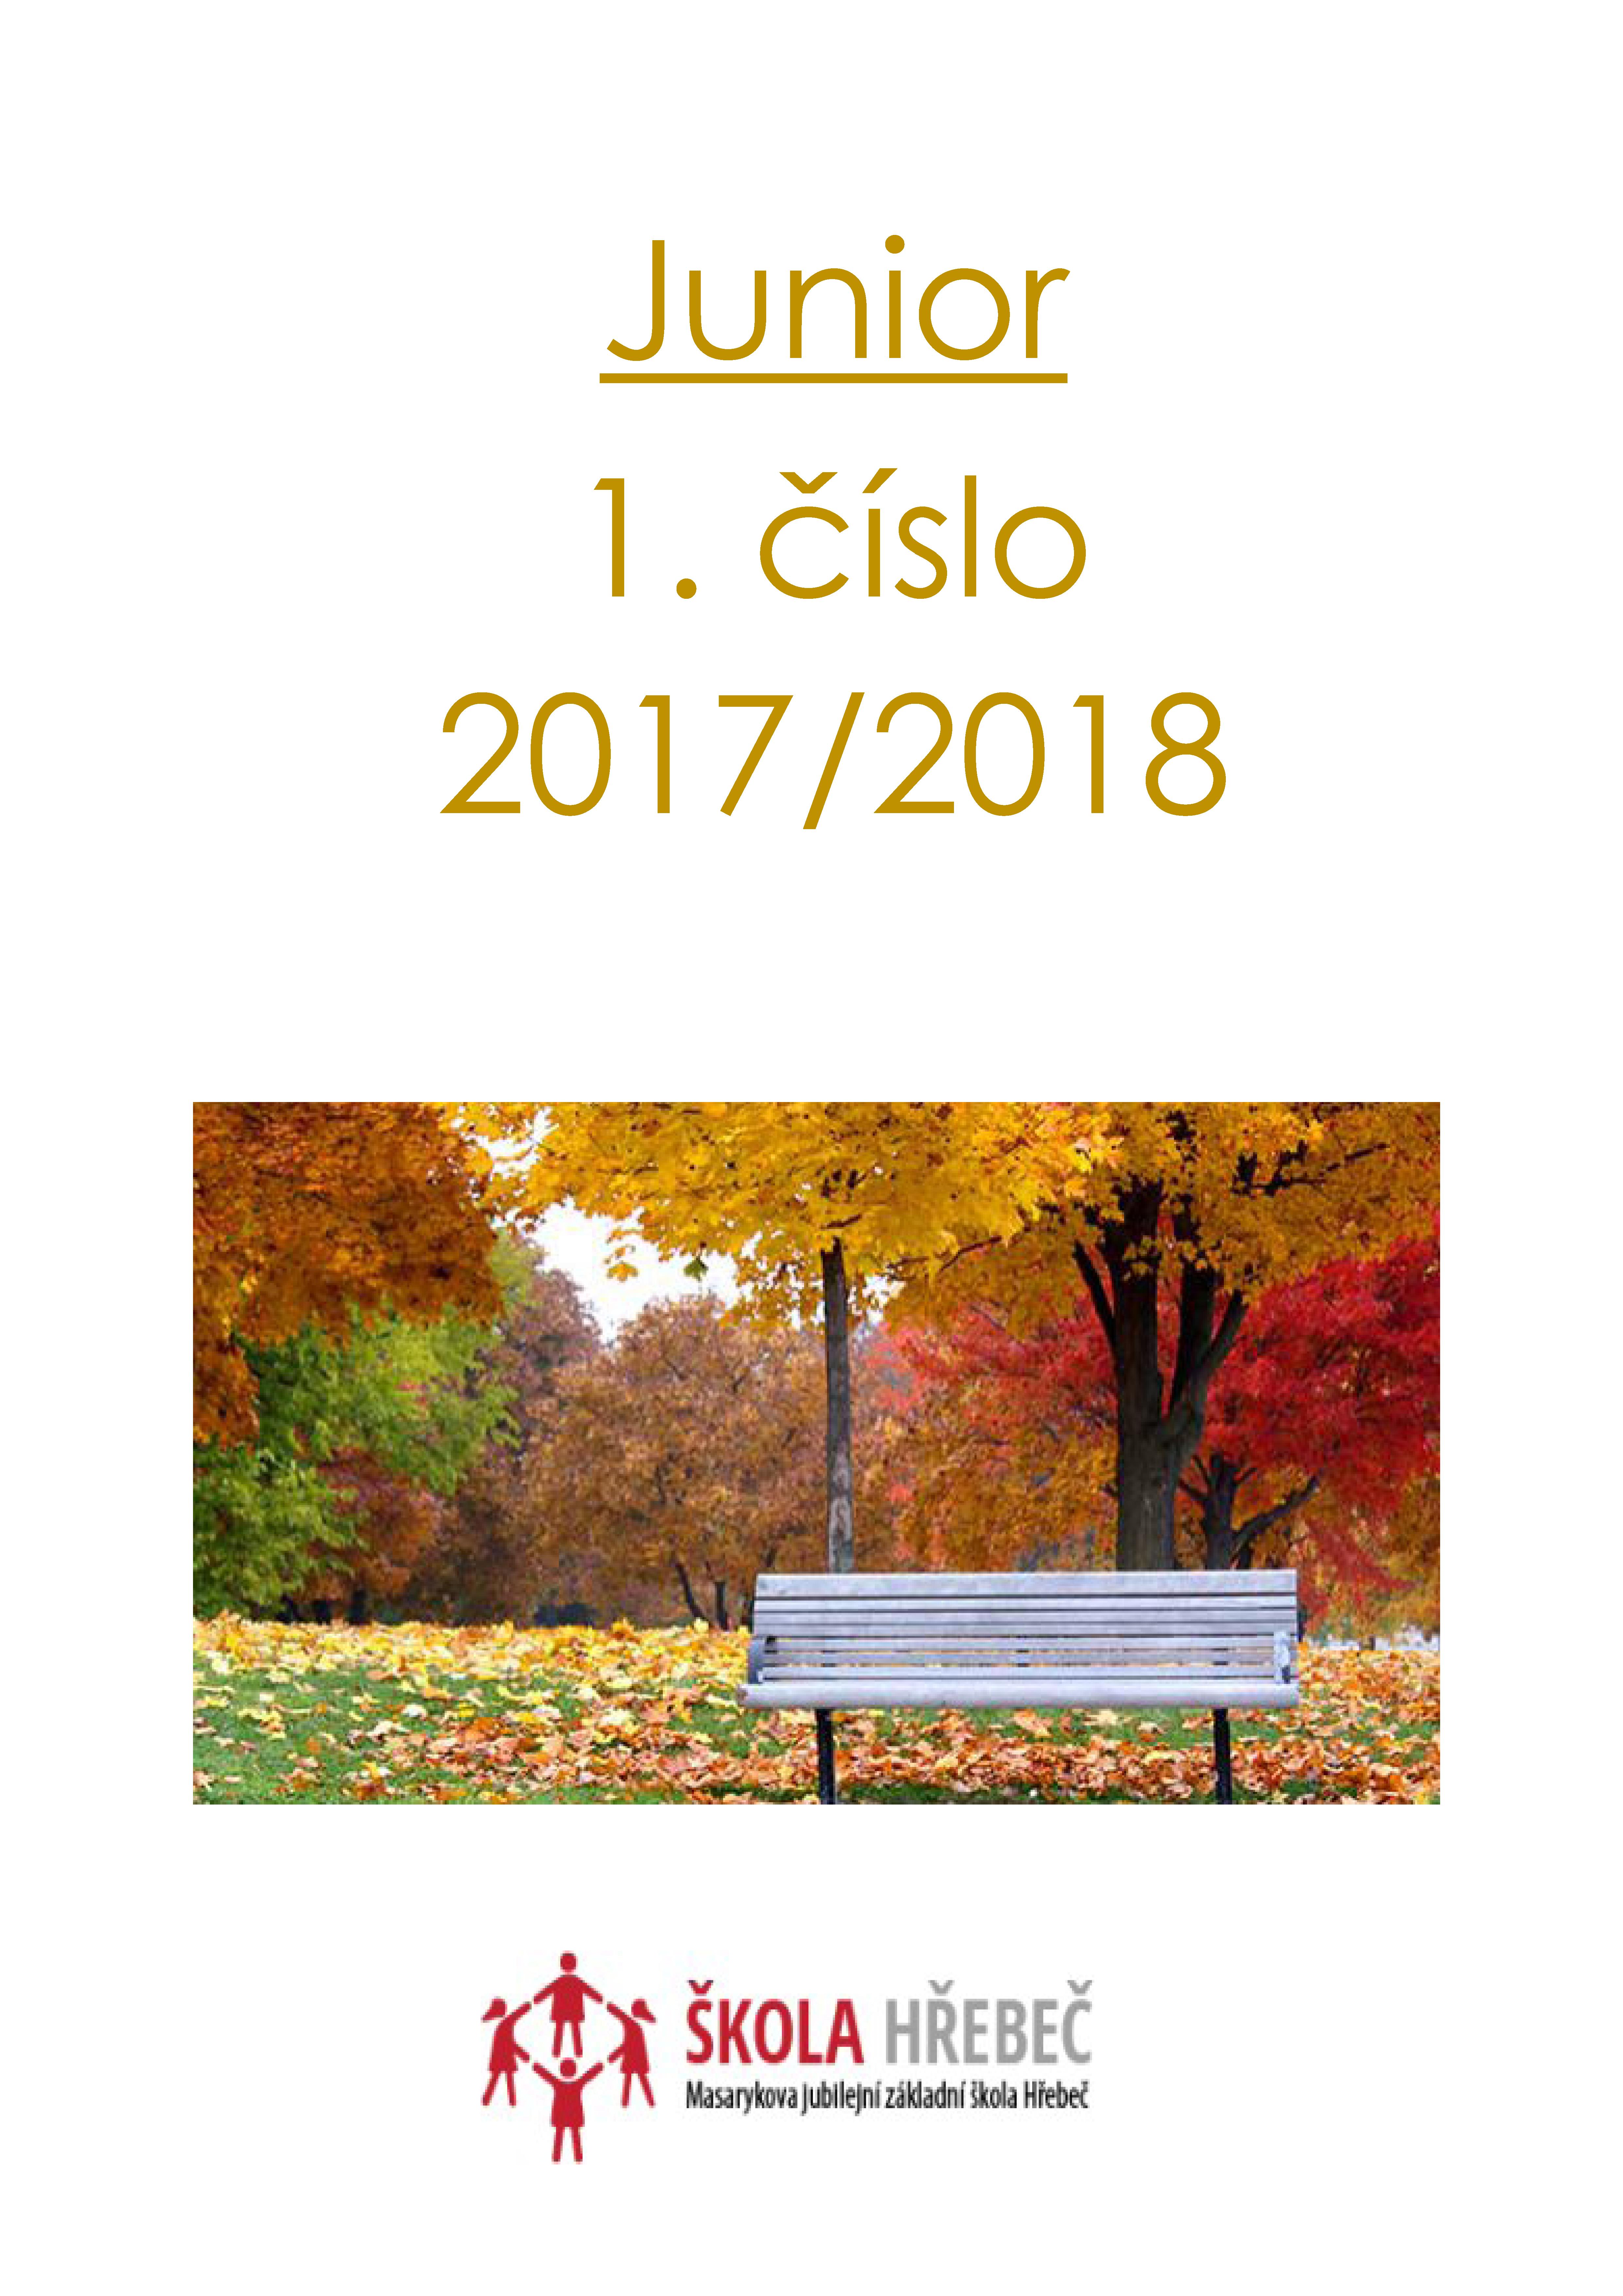 20171212 Junior 2017 2018 říjen shrnutí Stránka 1